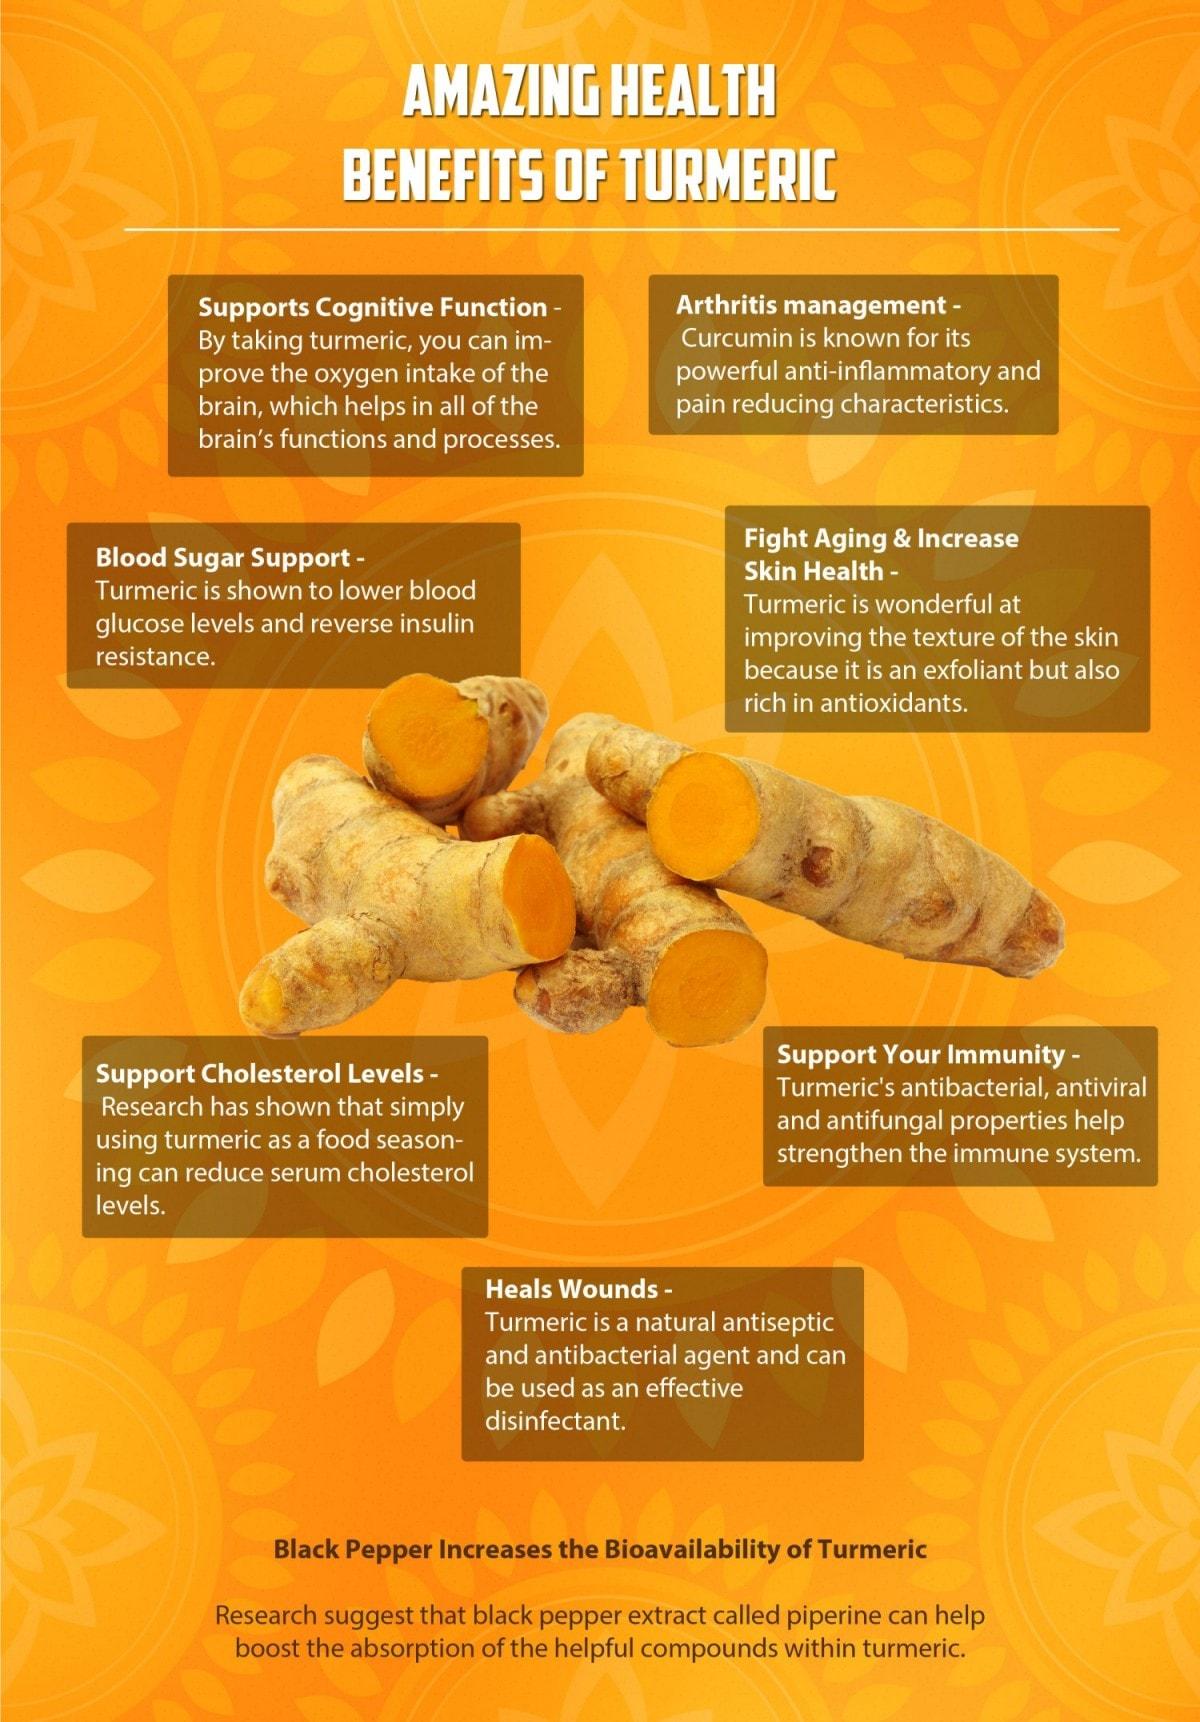 Turmeric Extract infographic